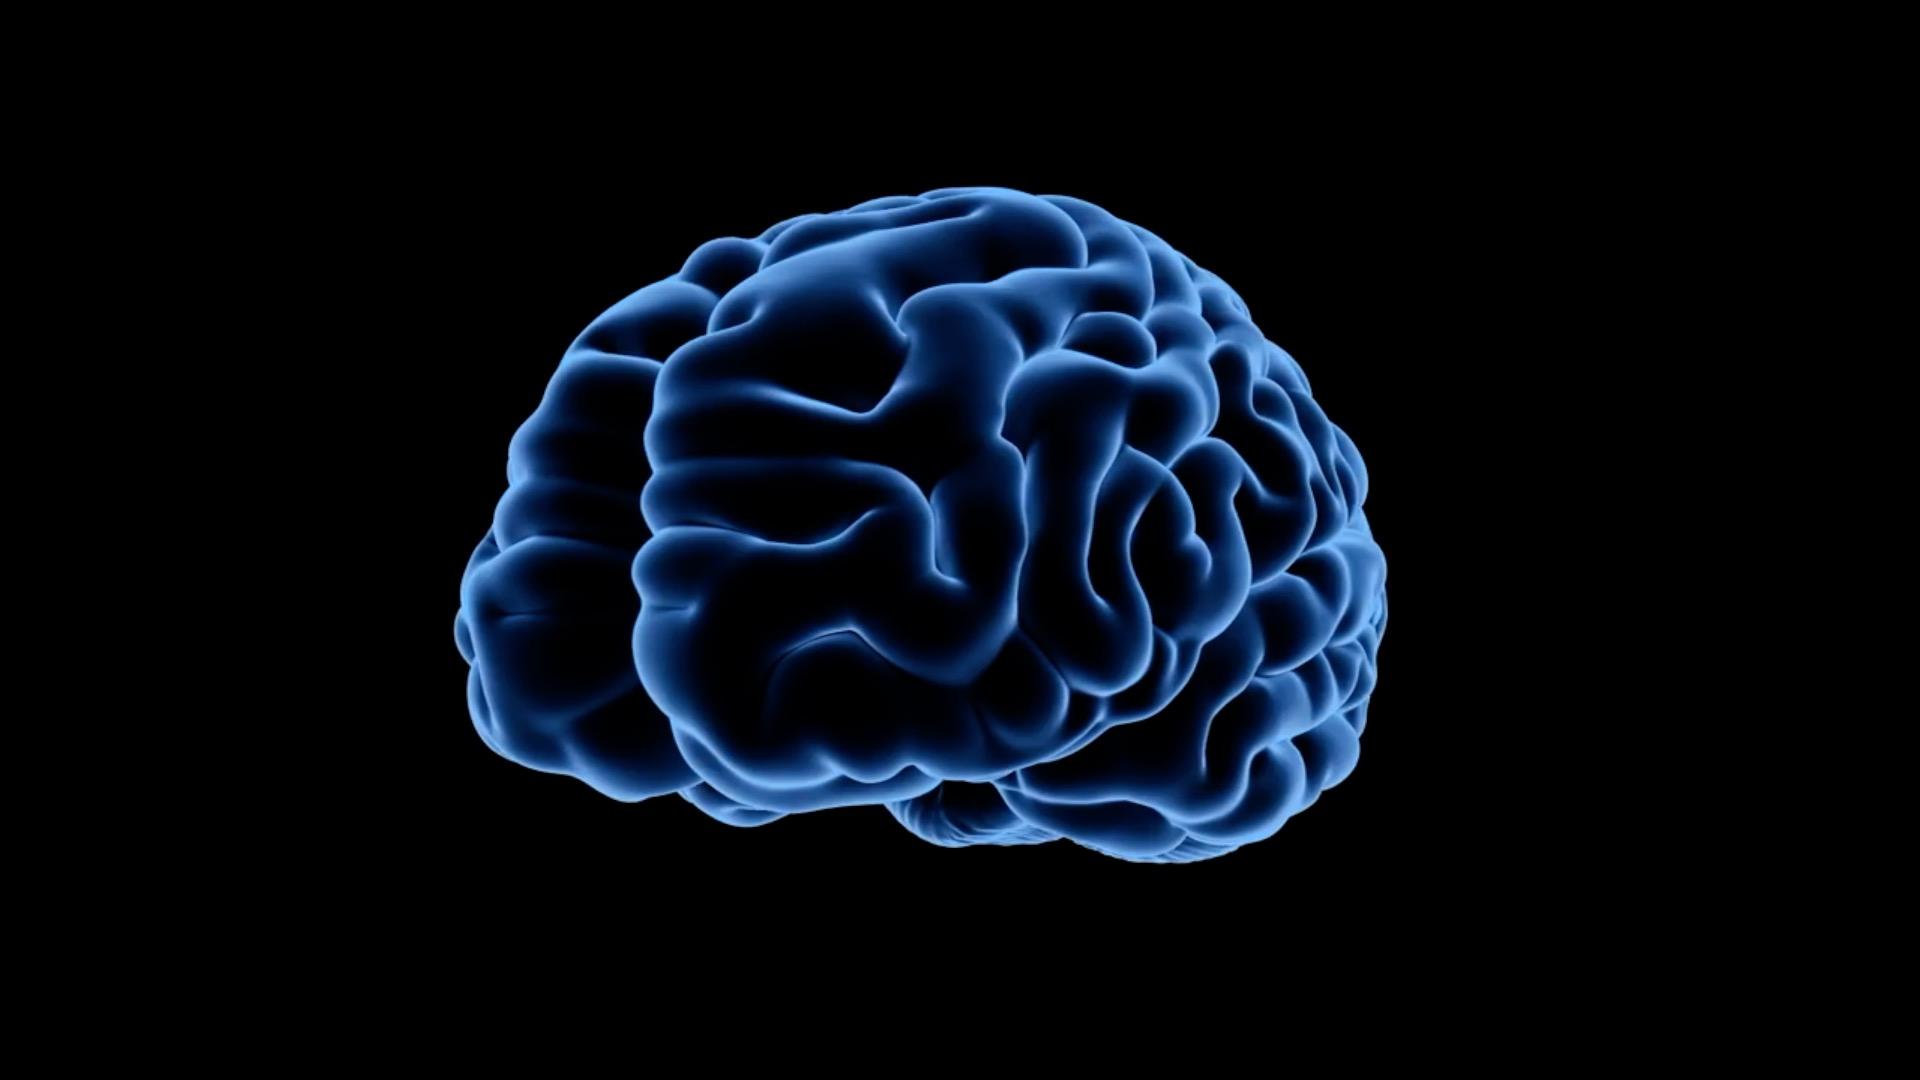 Investigadores inician un ensayo con un tratamiento que combina virus e inmunoterapia en tumores cerebral